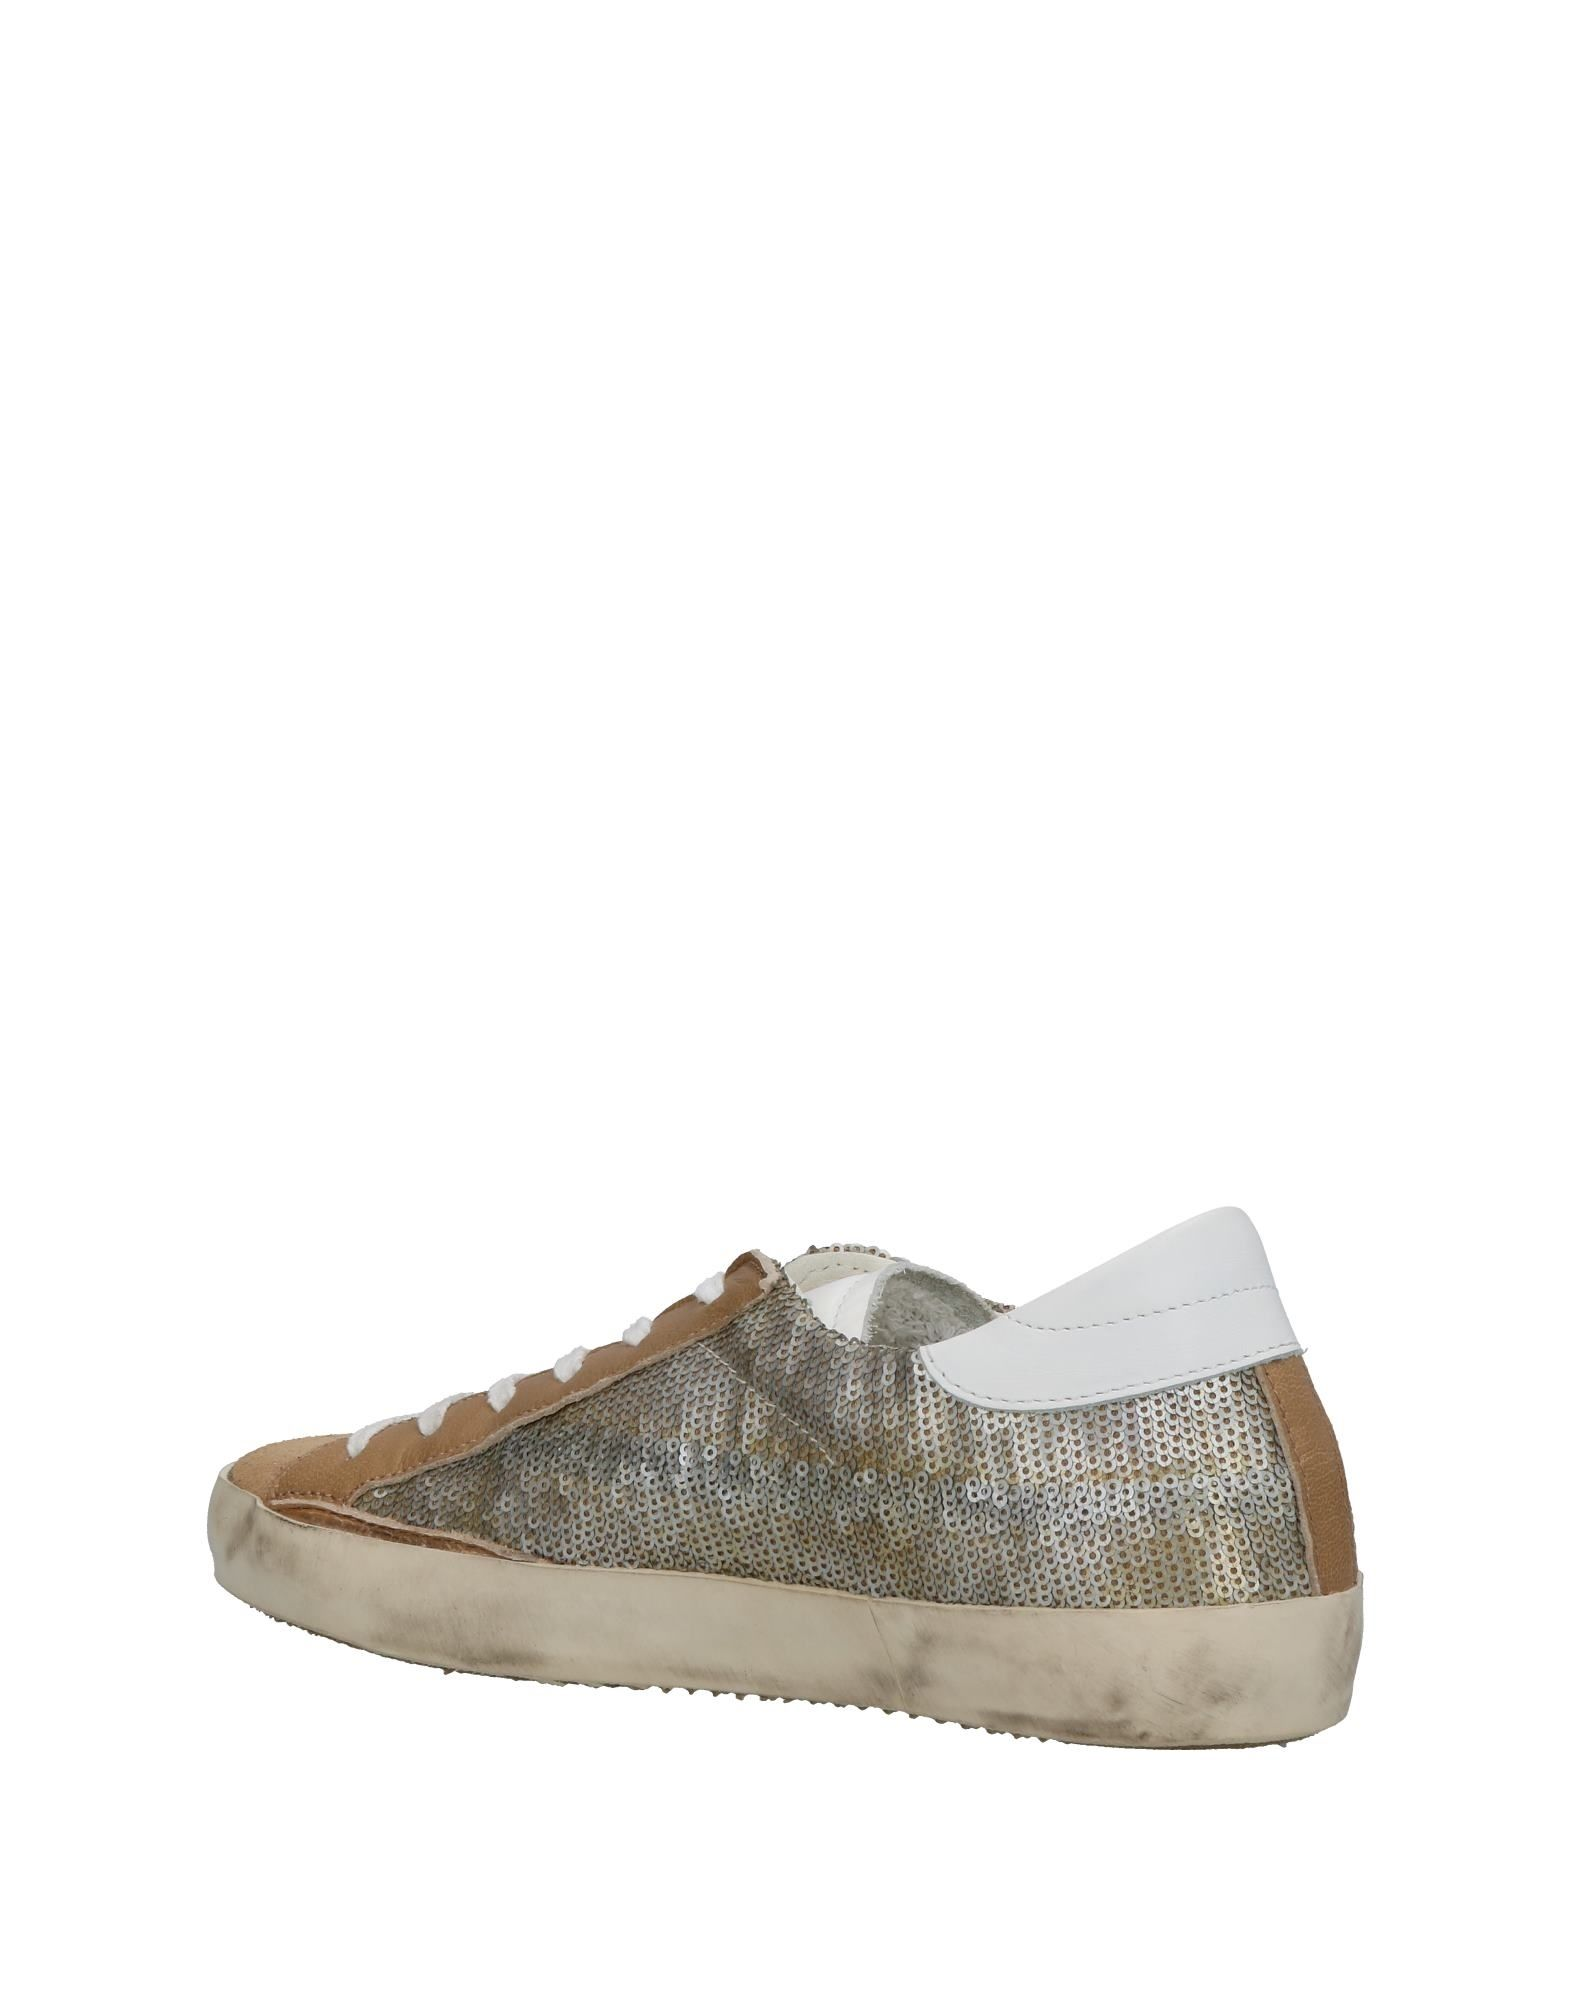 Philippe Model Sneakers Damen  11396704BHGut aussehende aussehende aussehende strapazierfähige Schuhe 7e354d